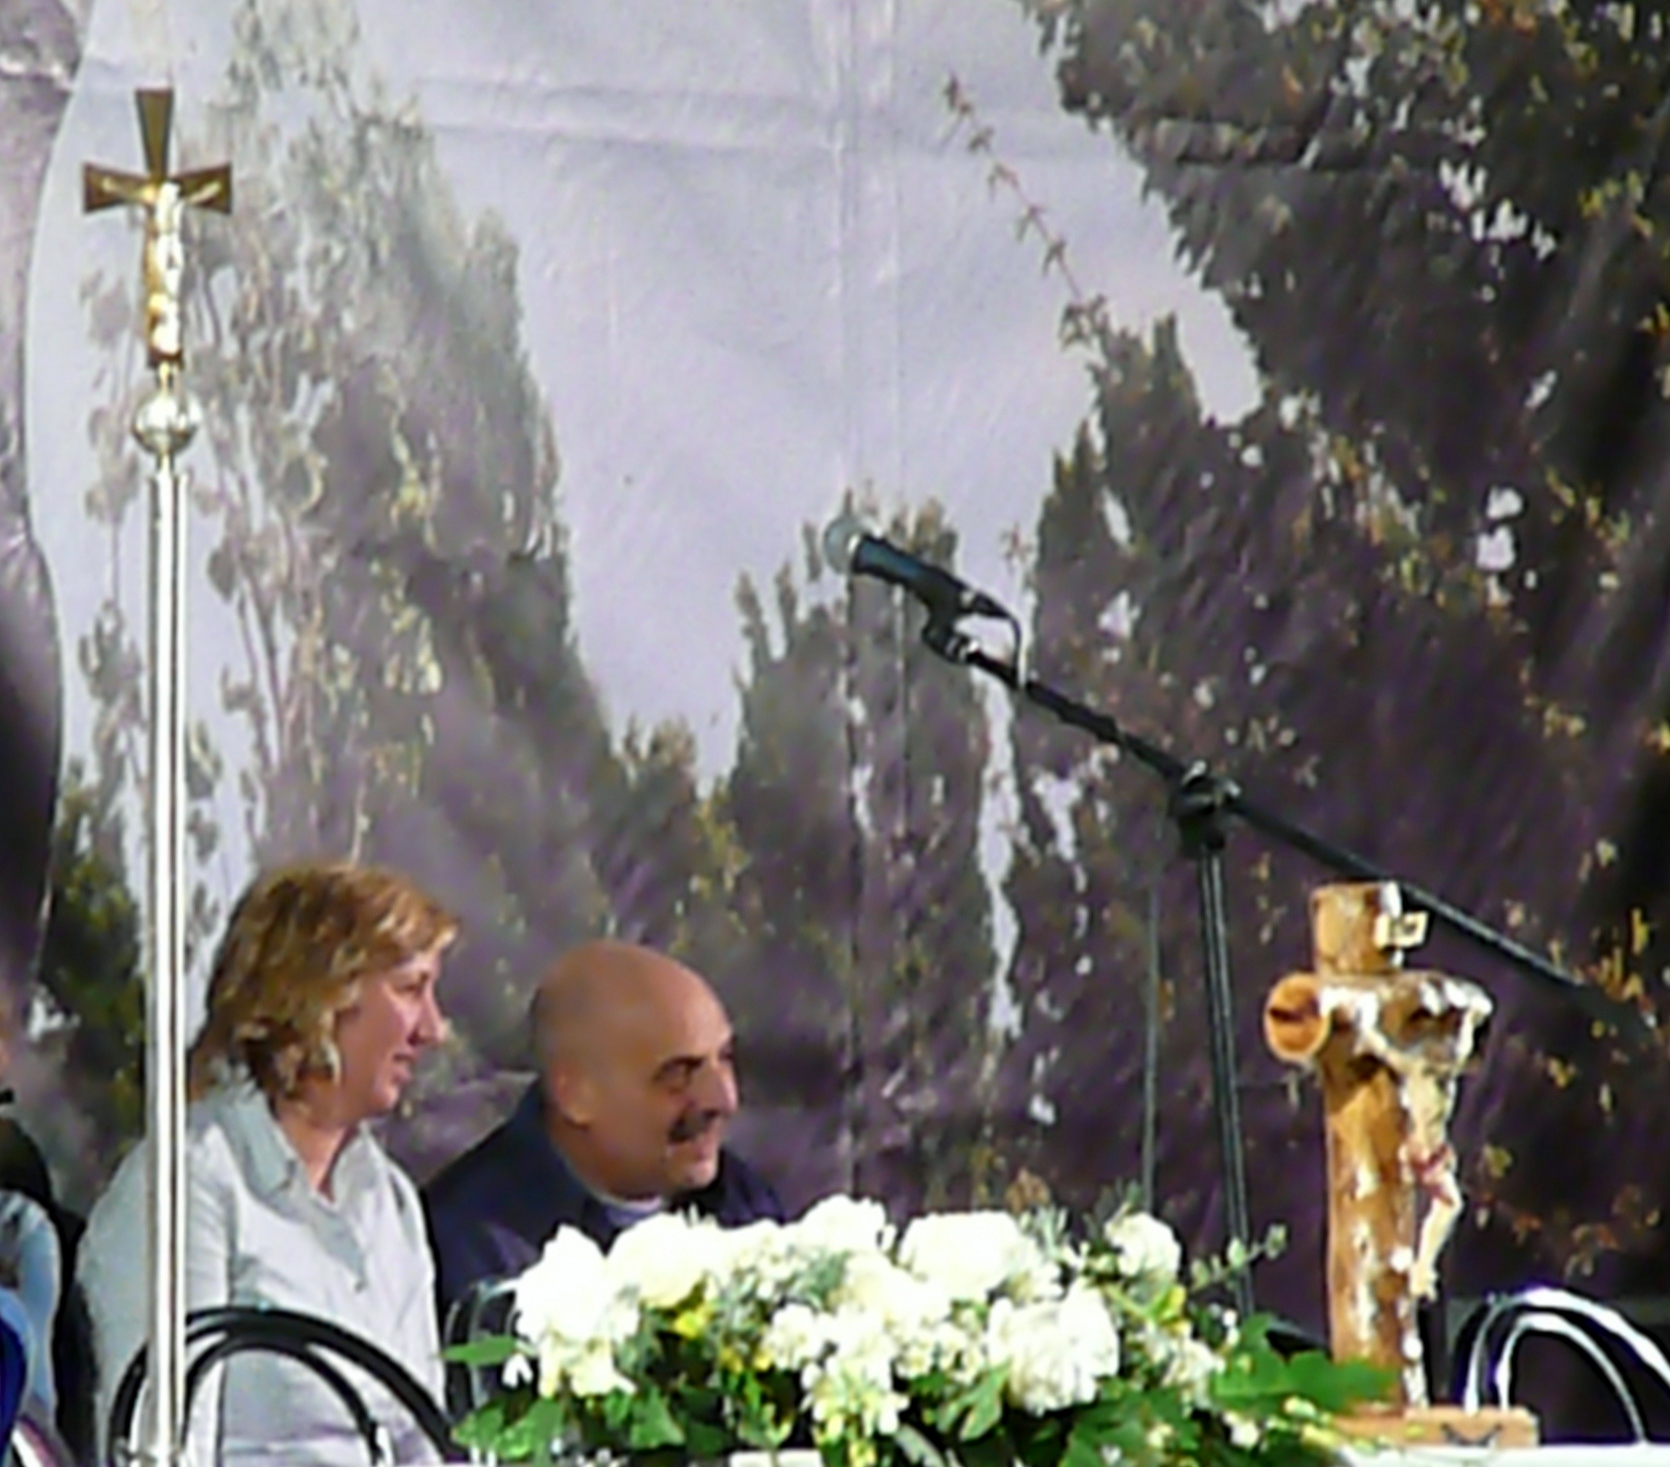 Paolo Brosio a Medjugorje assieme alla veggente Marija Pavlović